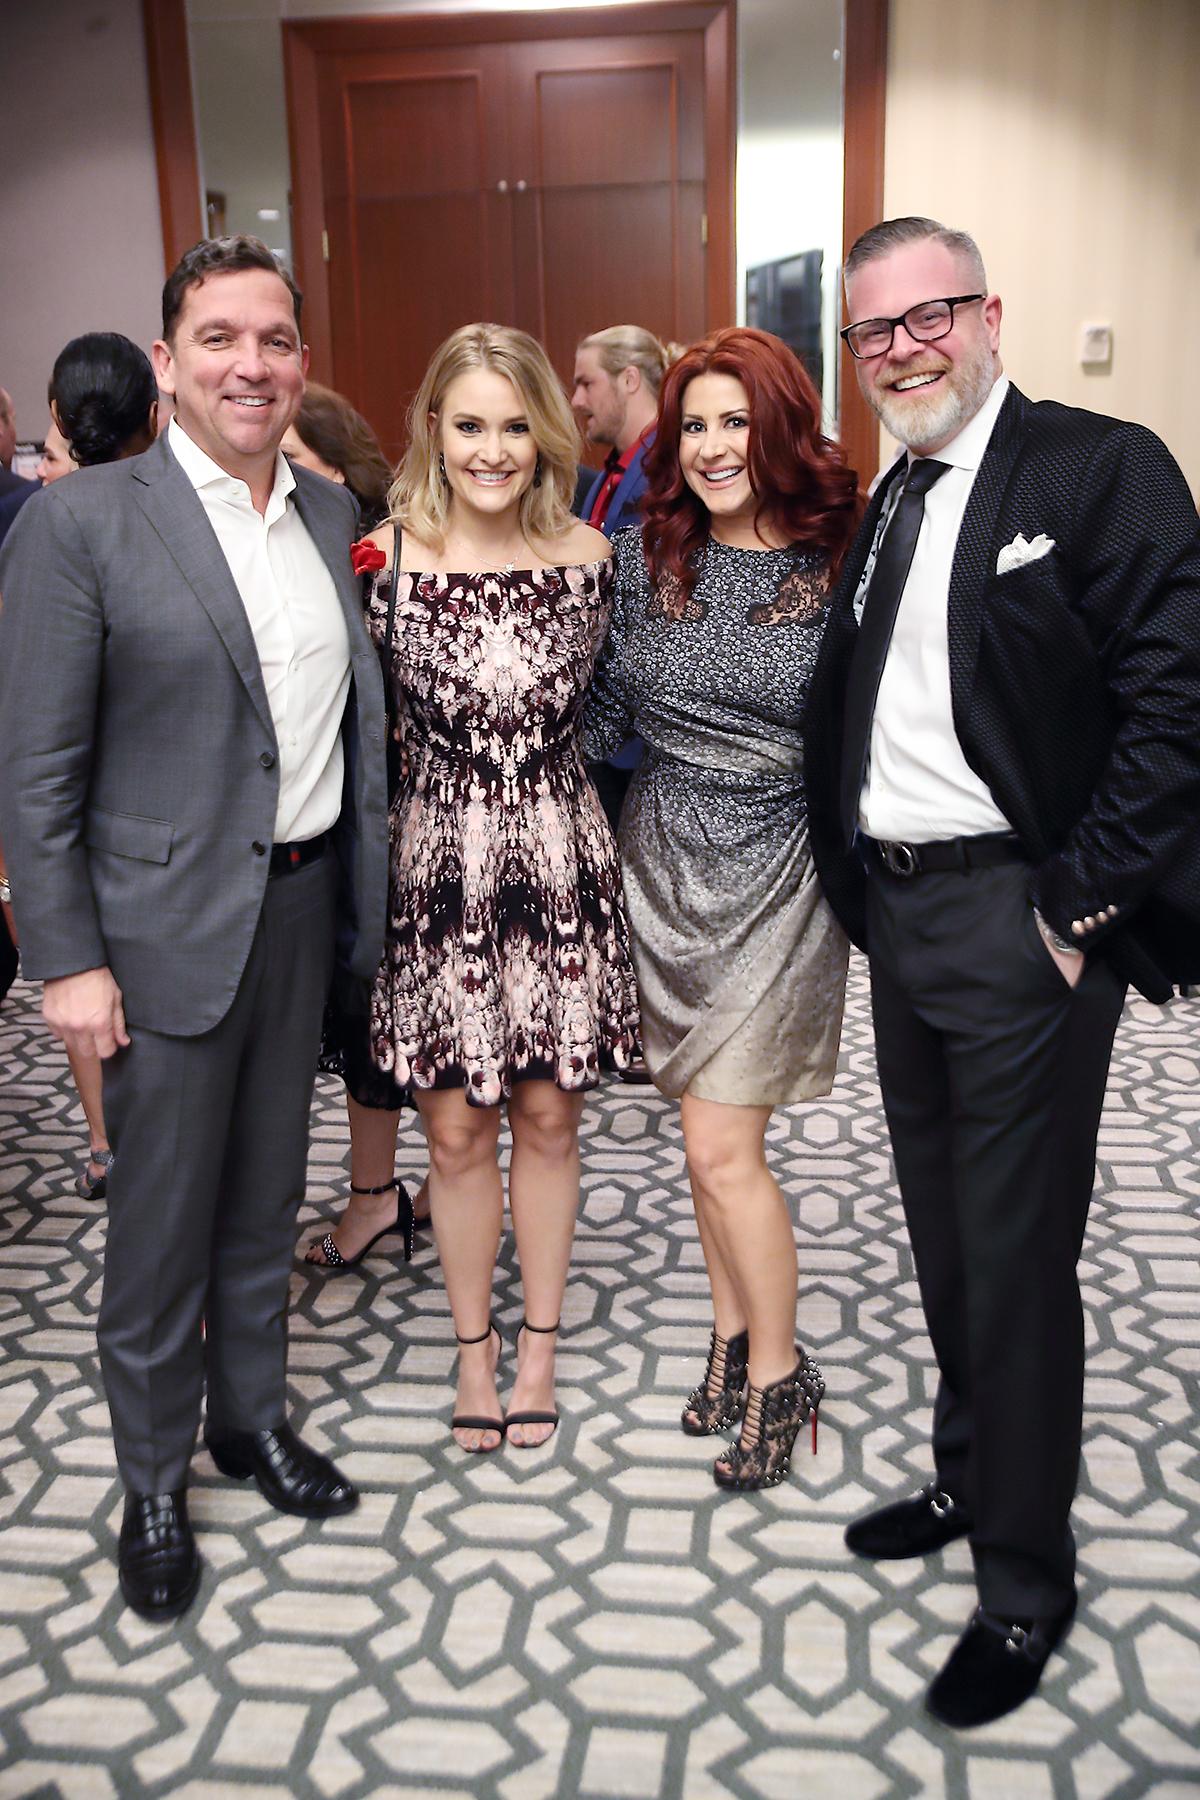 Tony Buzbee, Frances Moody & Jennifer and Chad Pinkerton